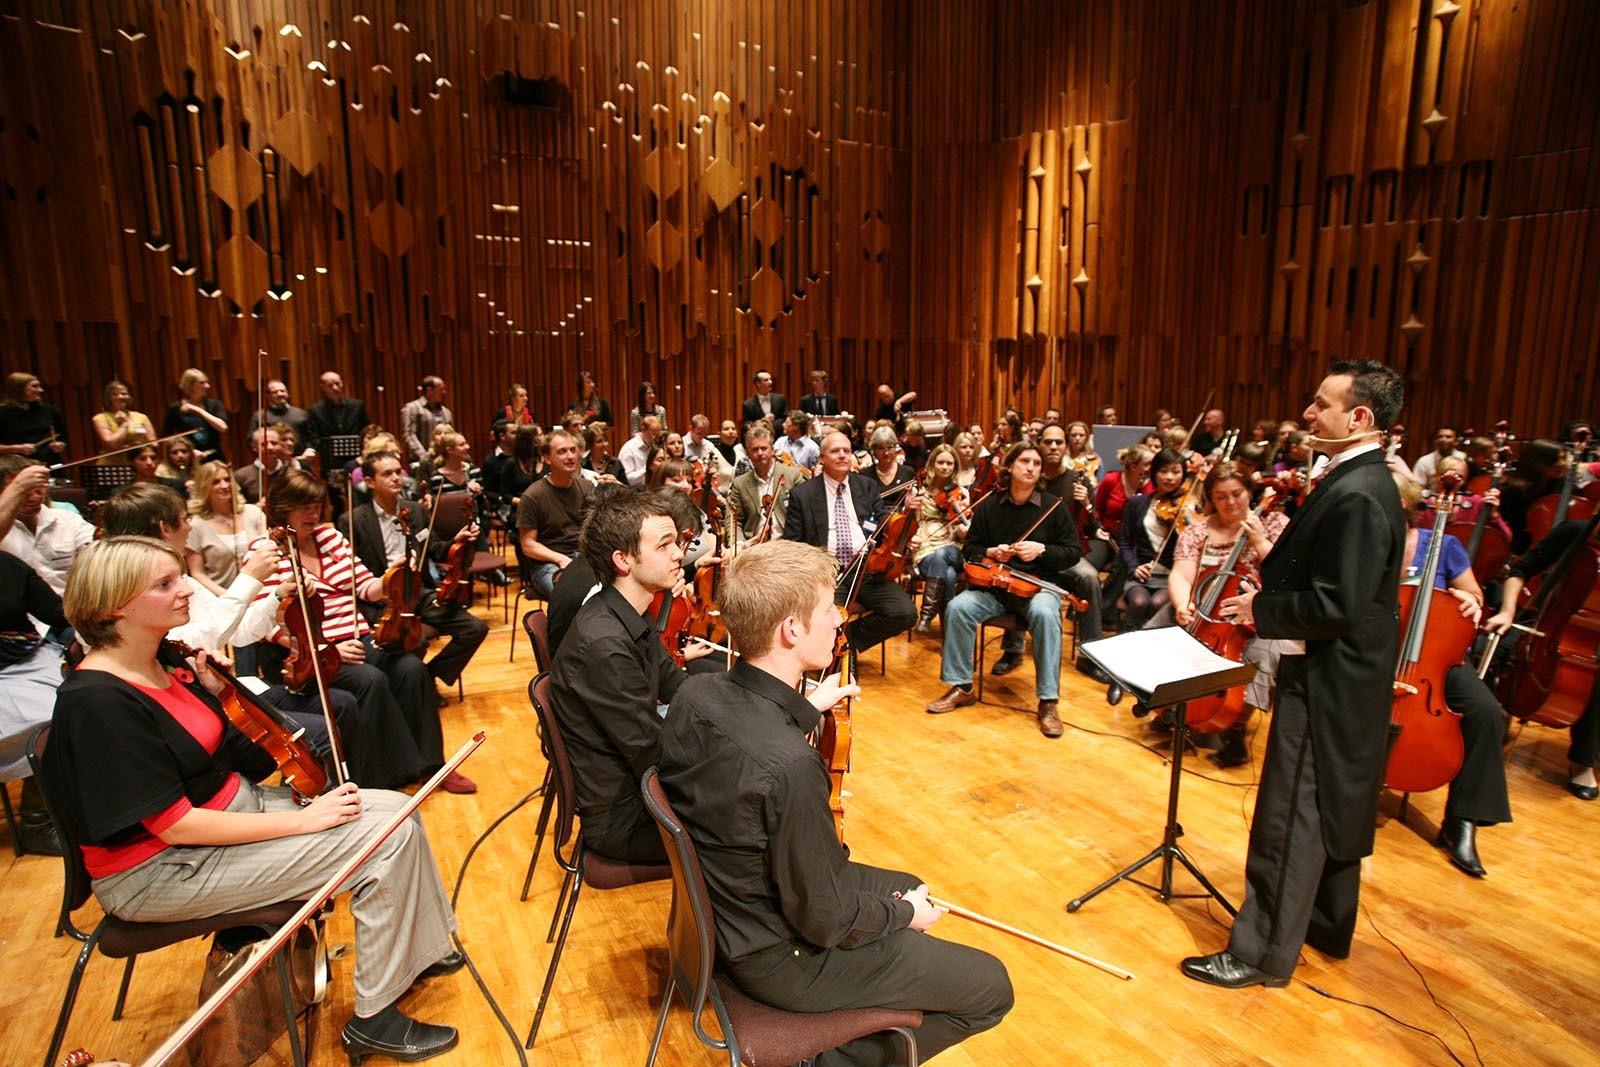 Hudebni dirigent vysvetluje ucastnikum jaka prace je za sestavenim orchestru pri hre Orchestrate